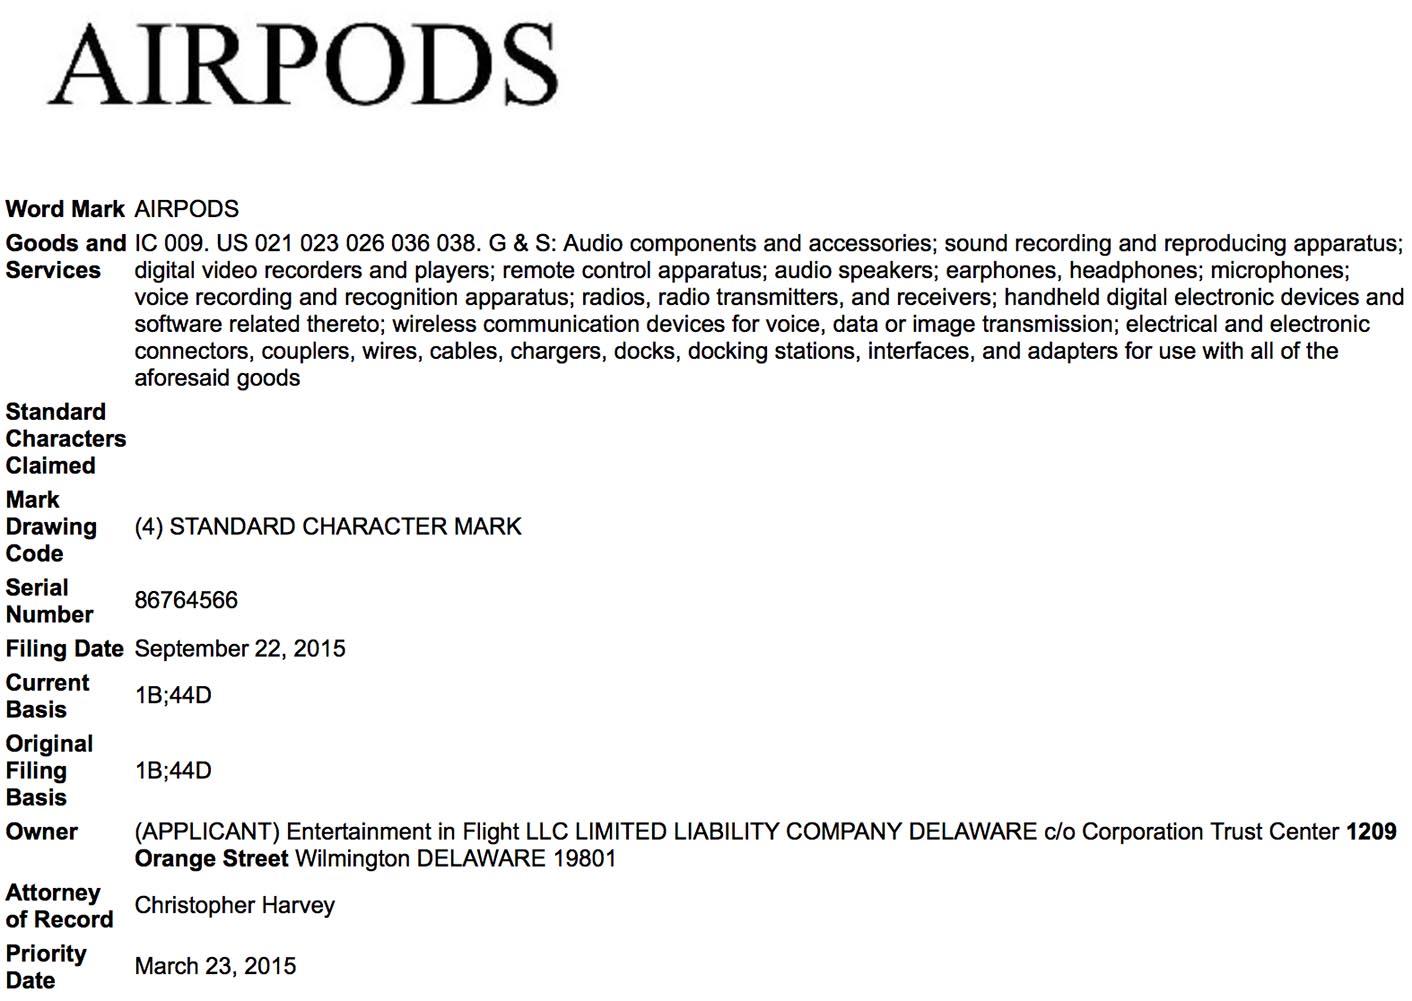 AirPods Trademark